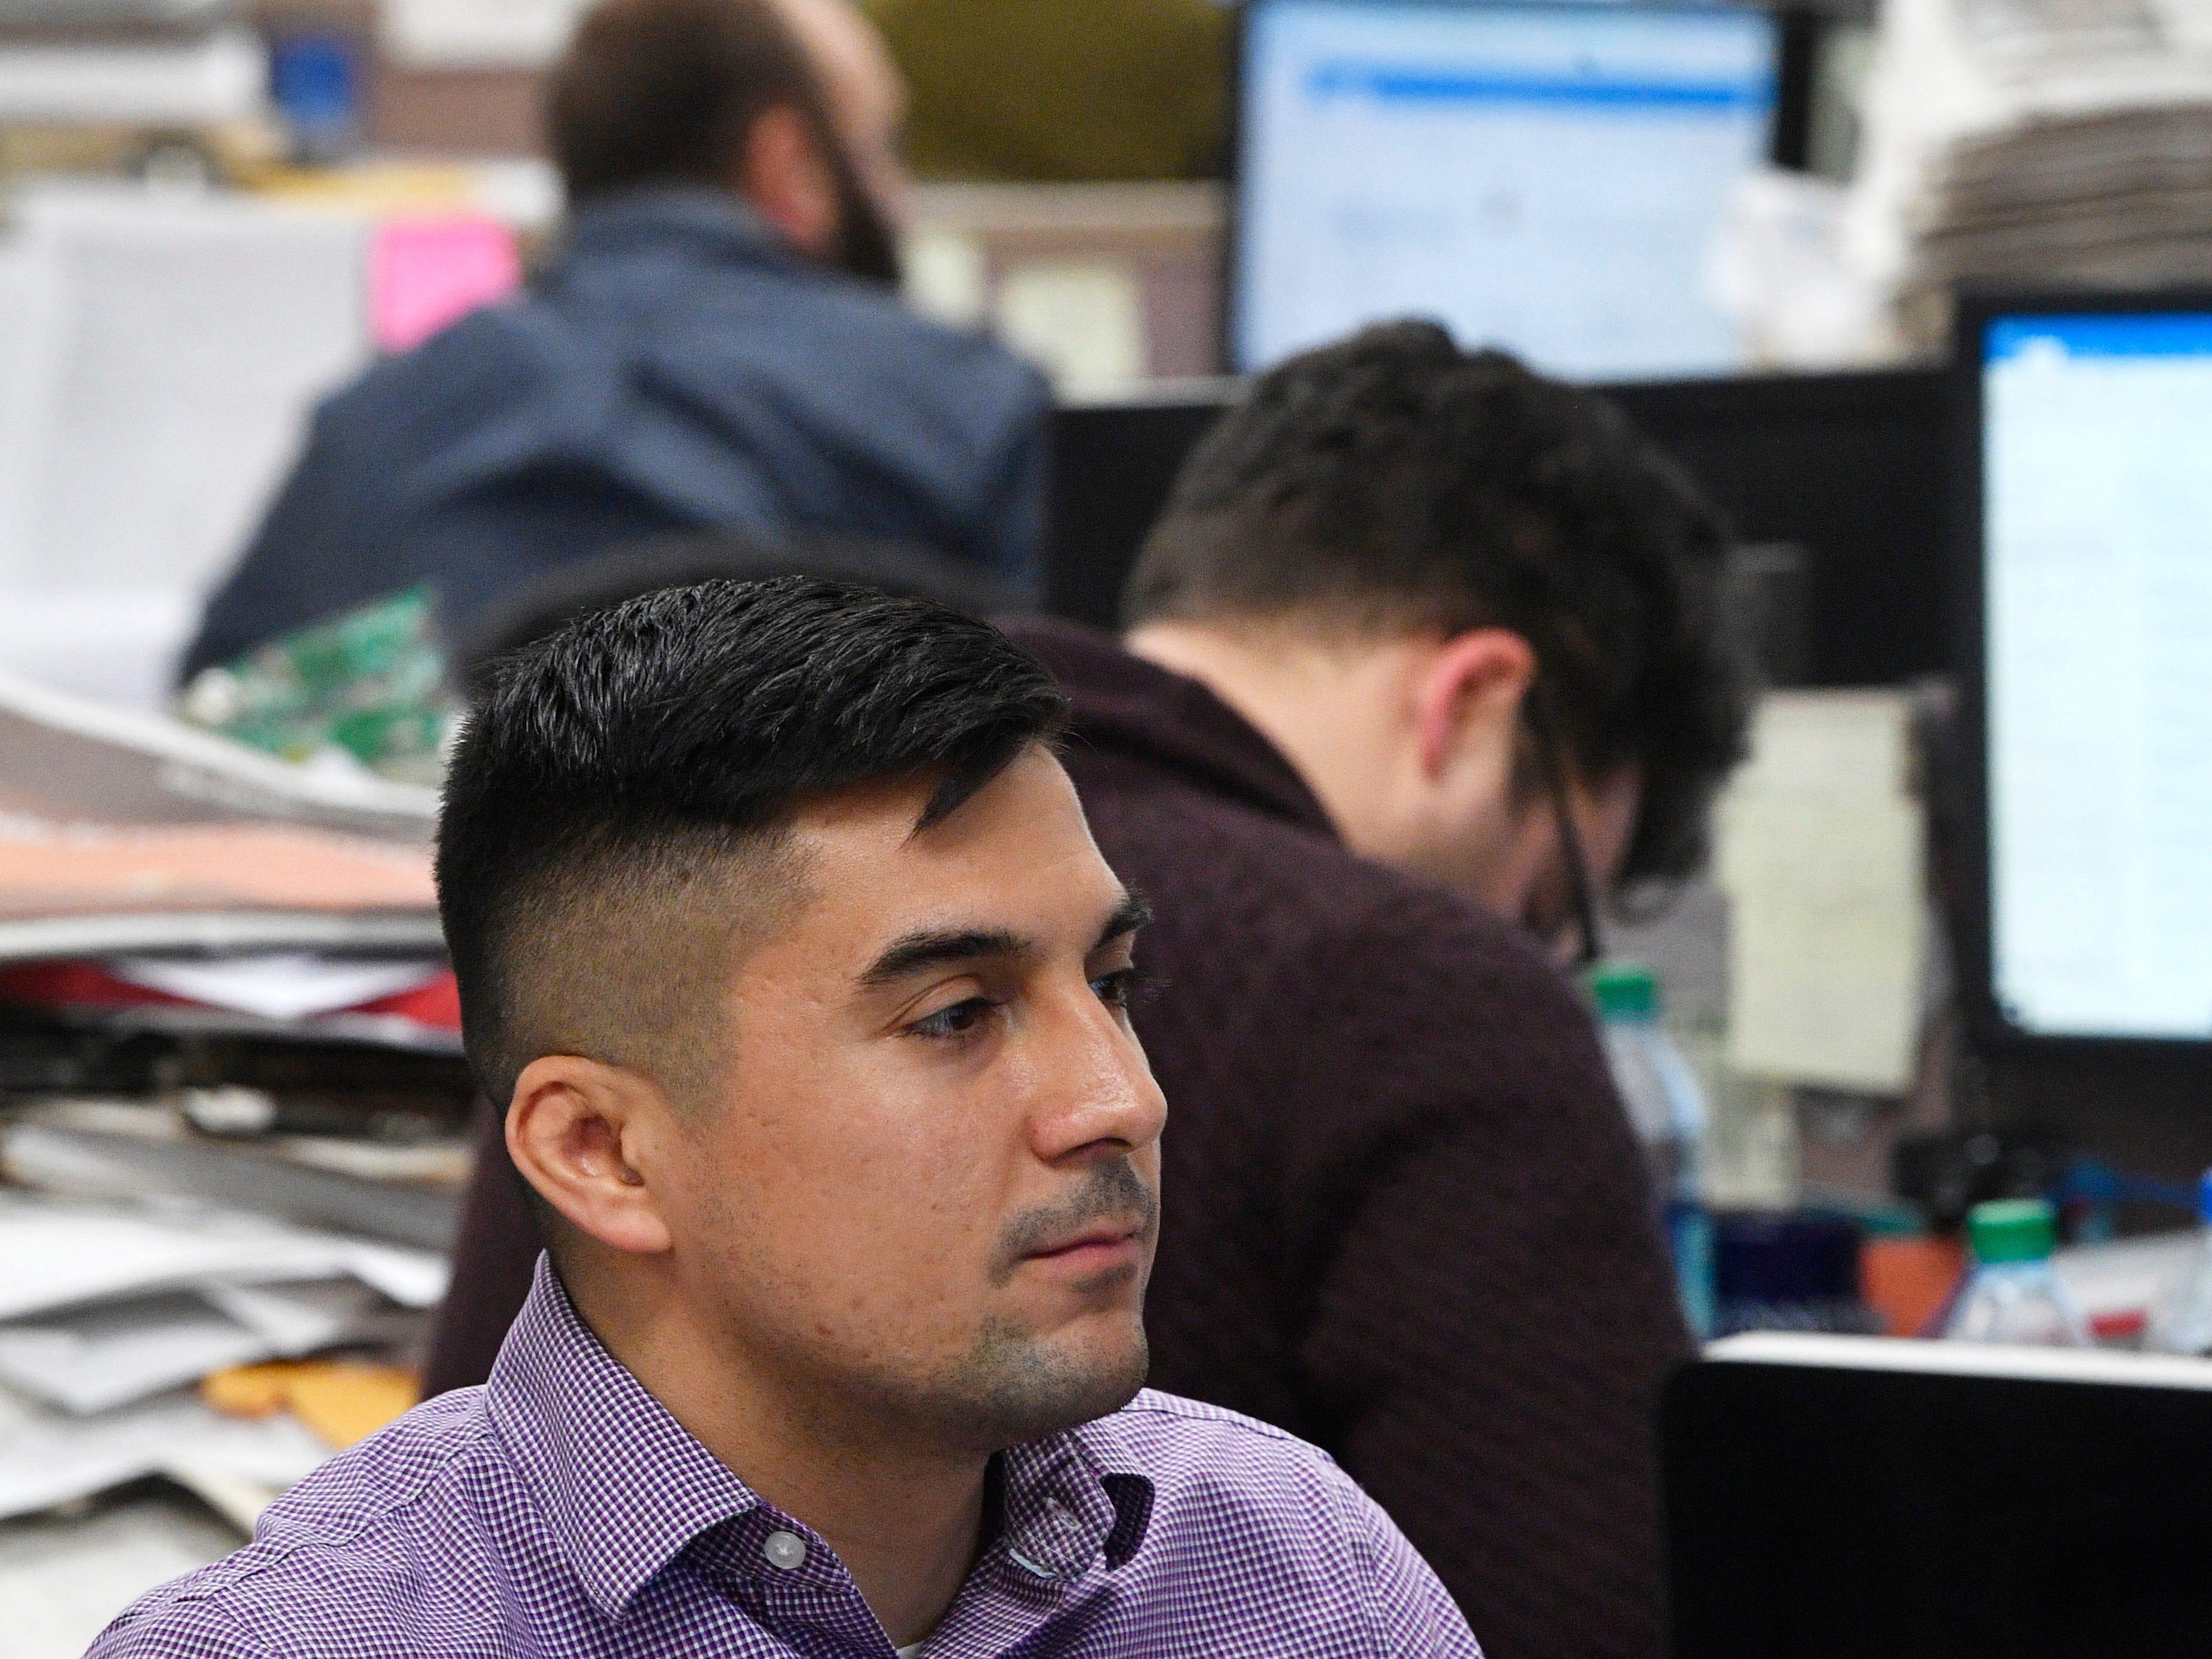 Education reporter Jason Gonzales works in The Tennessean newsroom Wednesday, Jan. 2, 2019, in Nashville.